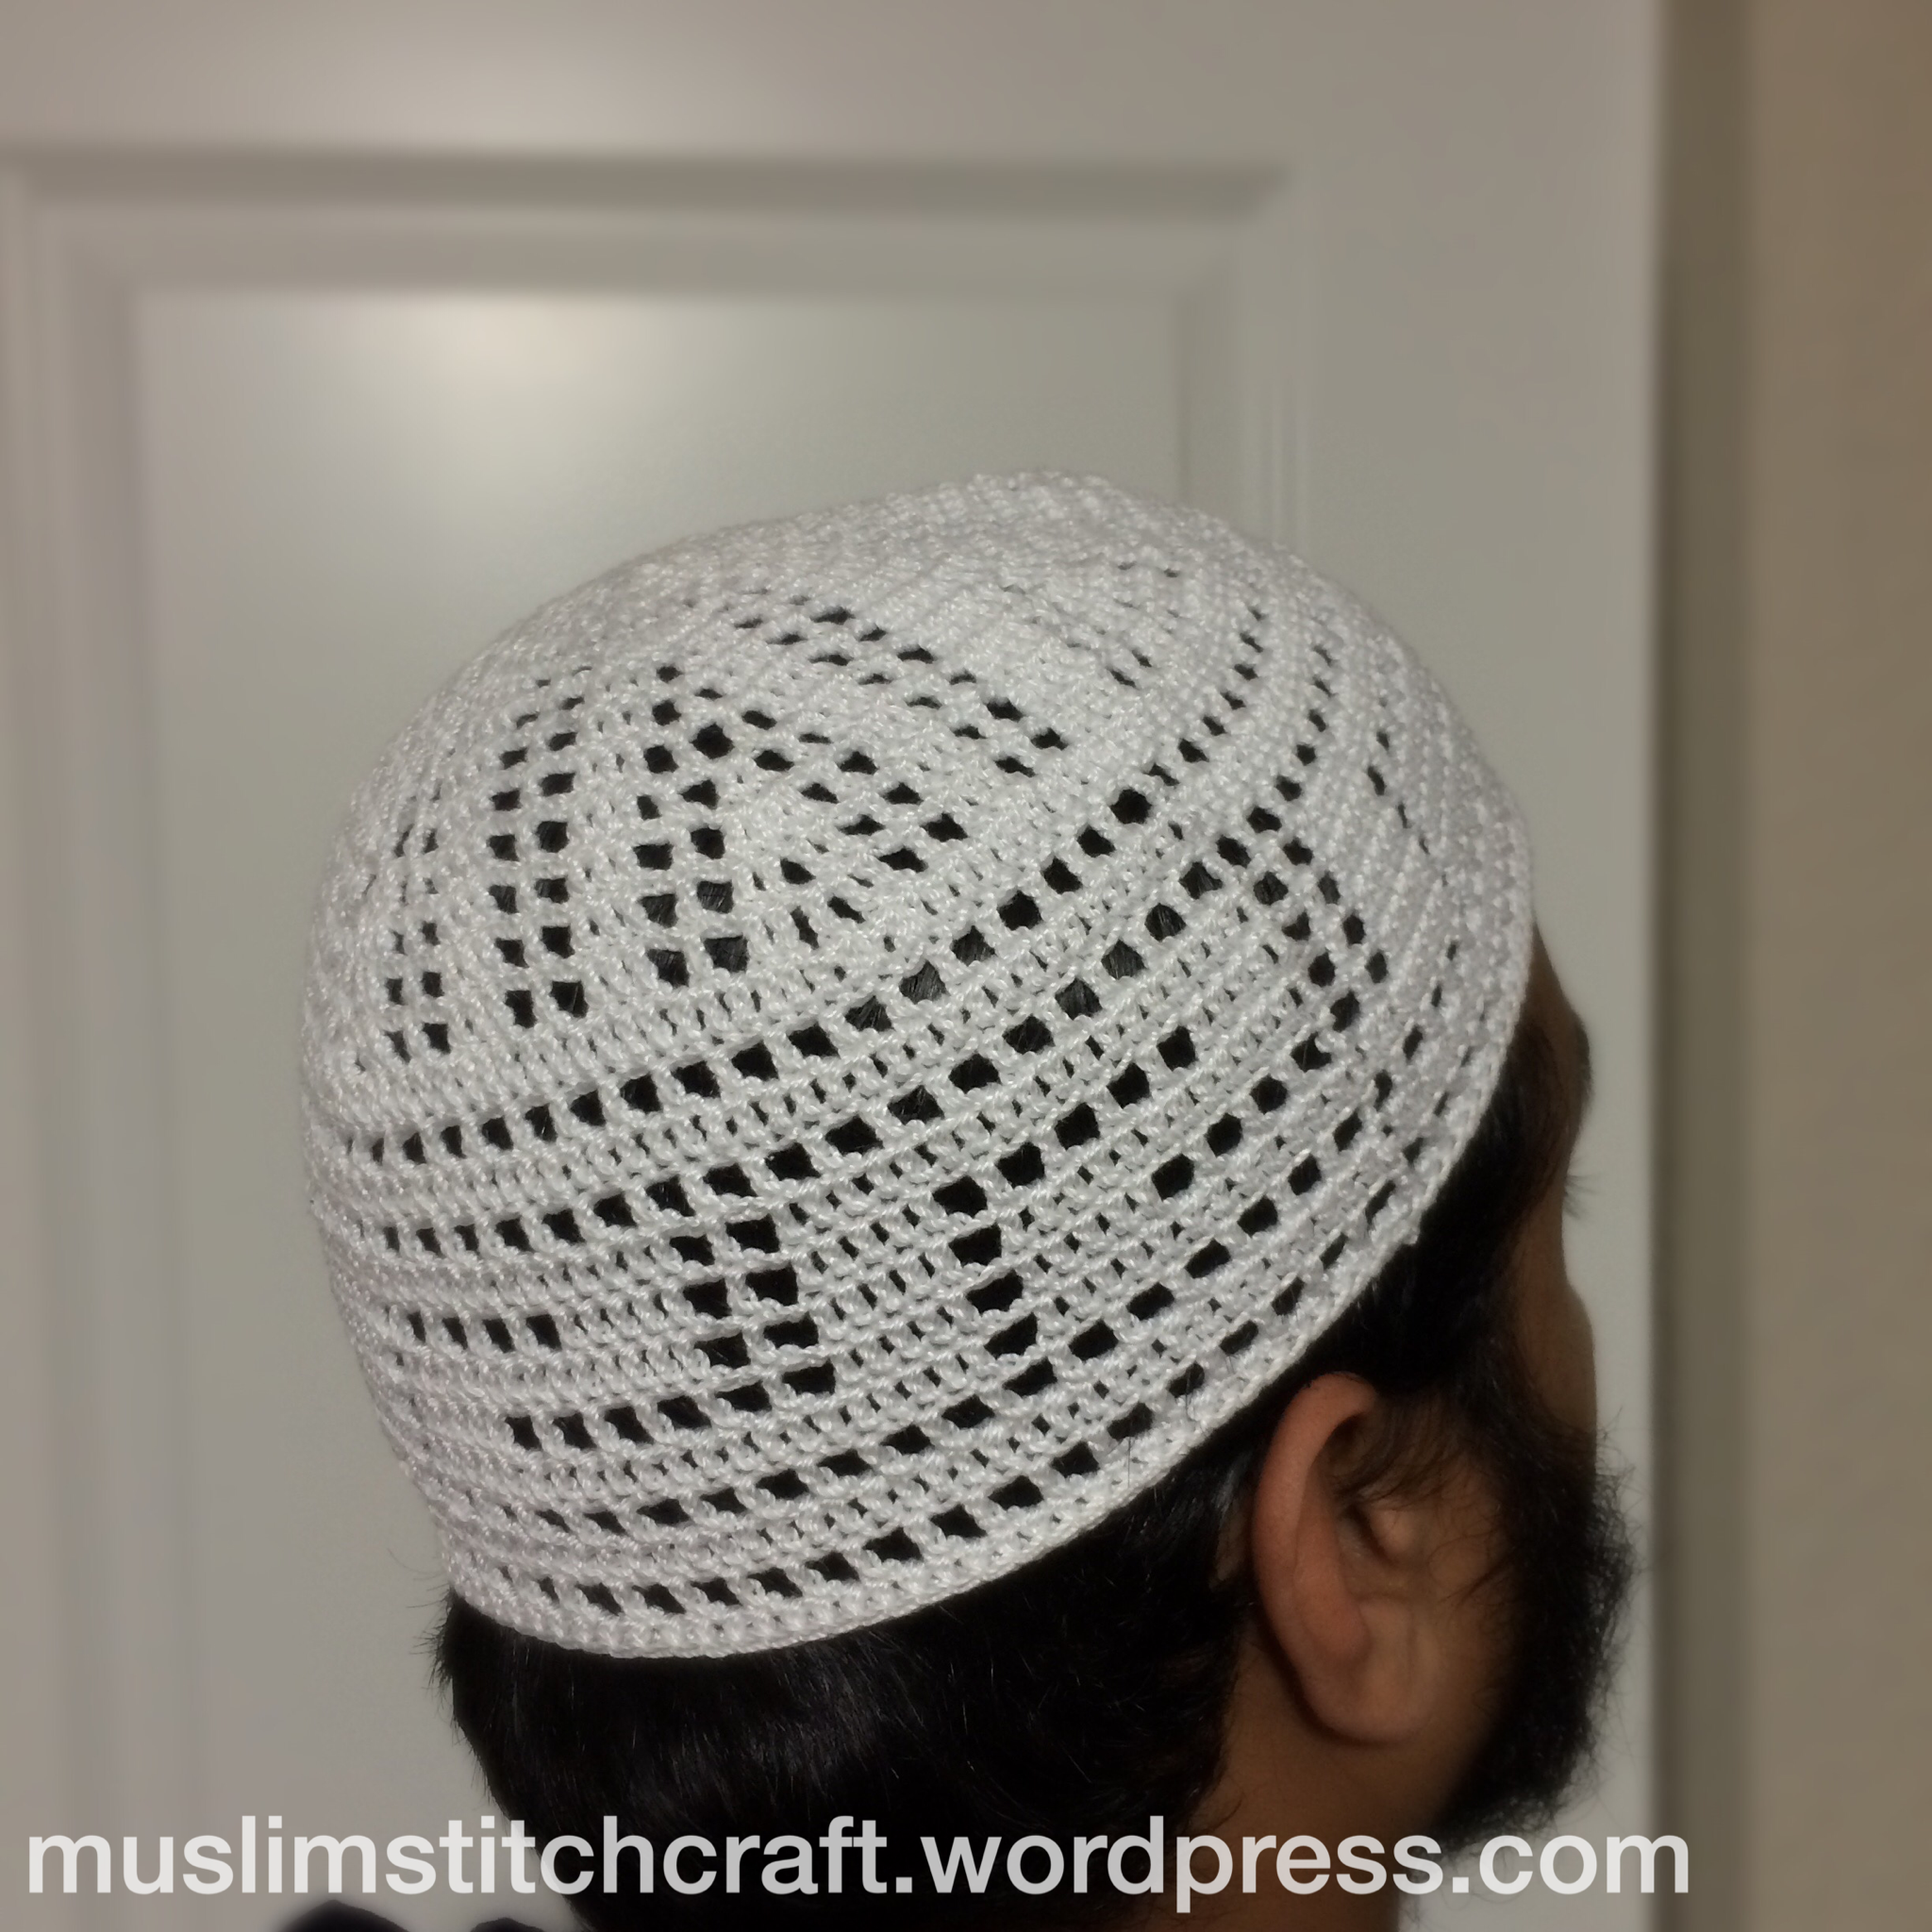 cc05b4e04cc Basic crochet kufi hat muslim stitchcraft png 1200x1200 Muslim hat